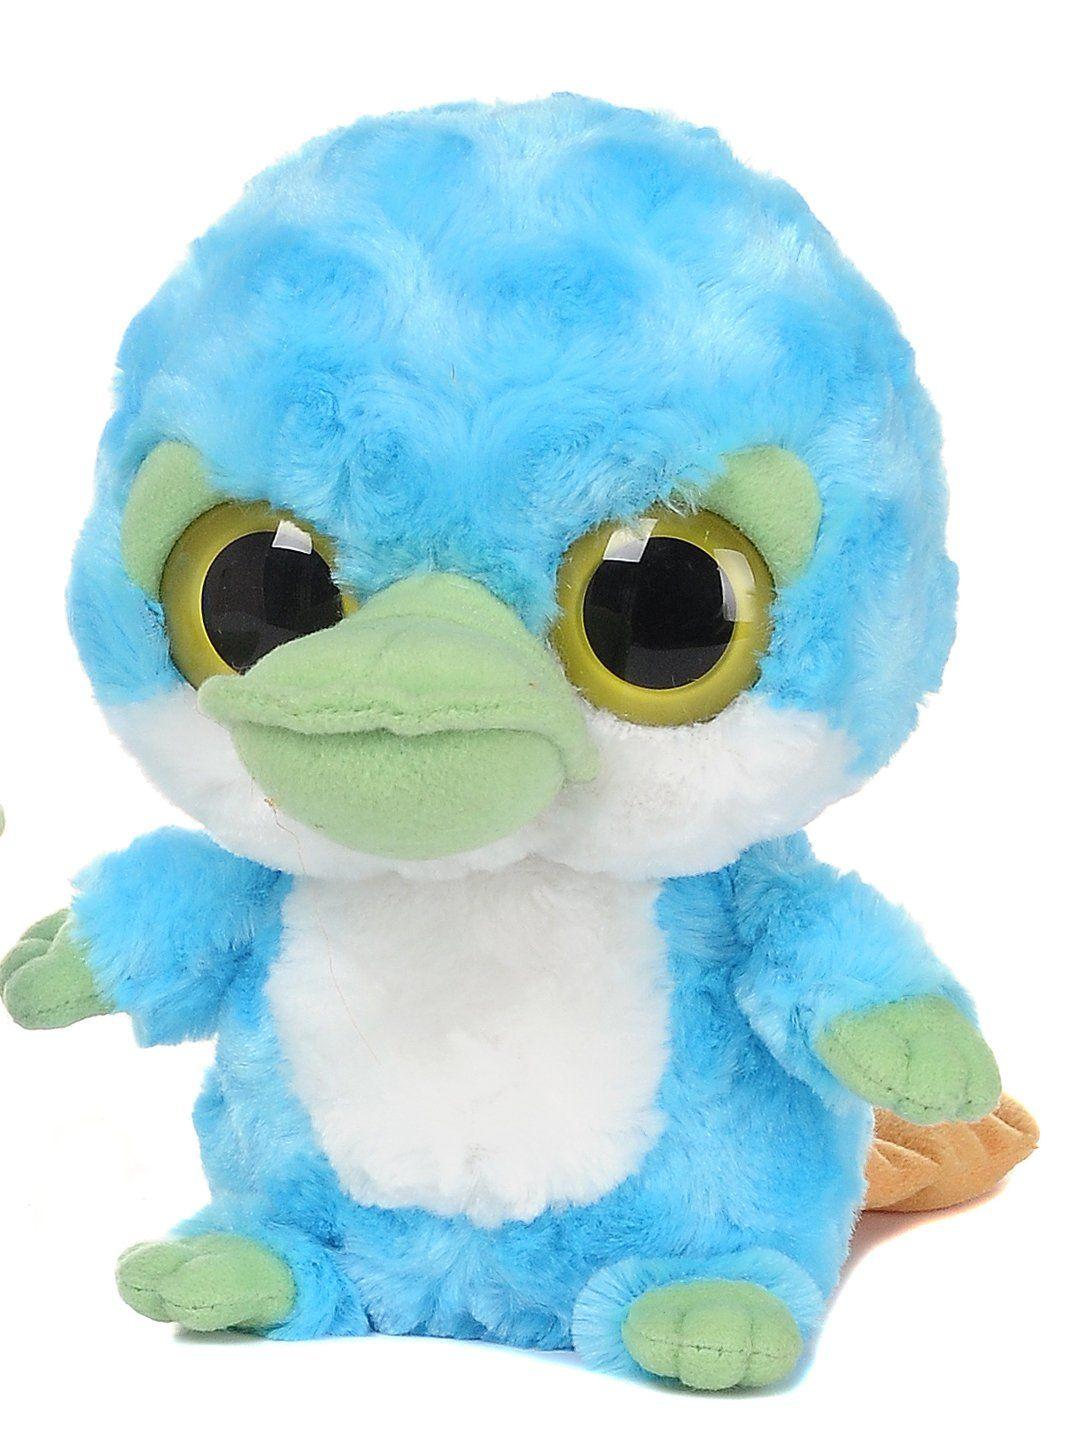 Yoohoo & Friends Platypus 5inch Amazon.co.uk Toys